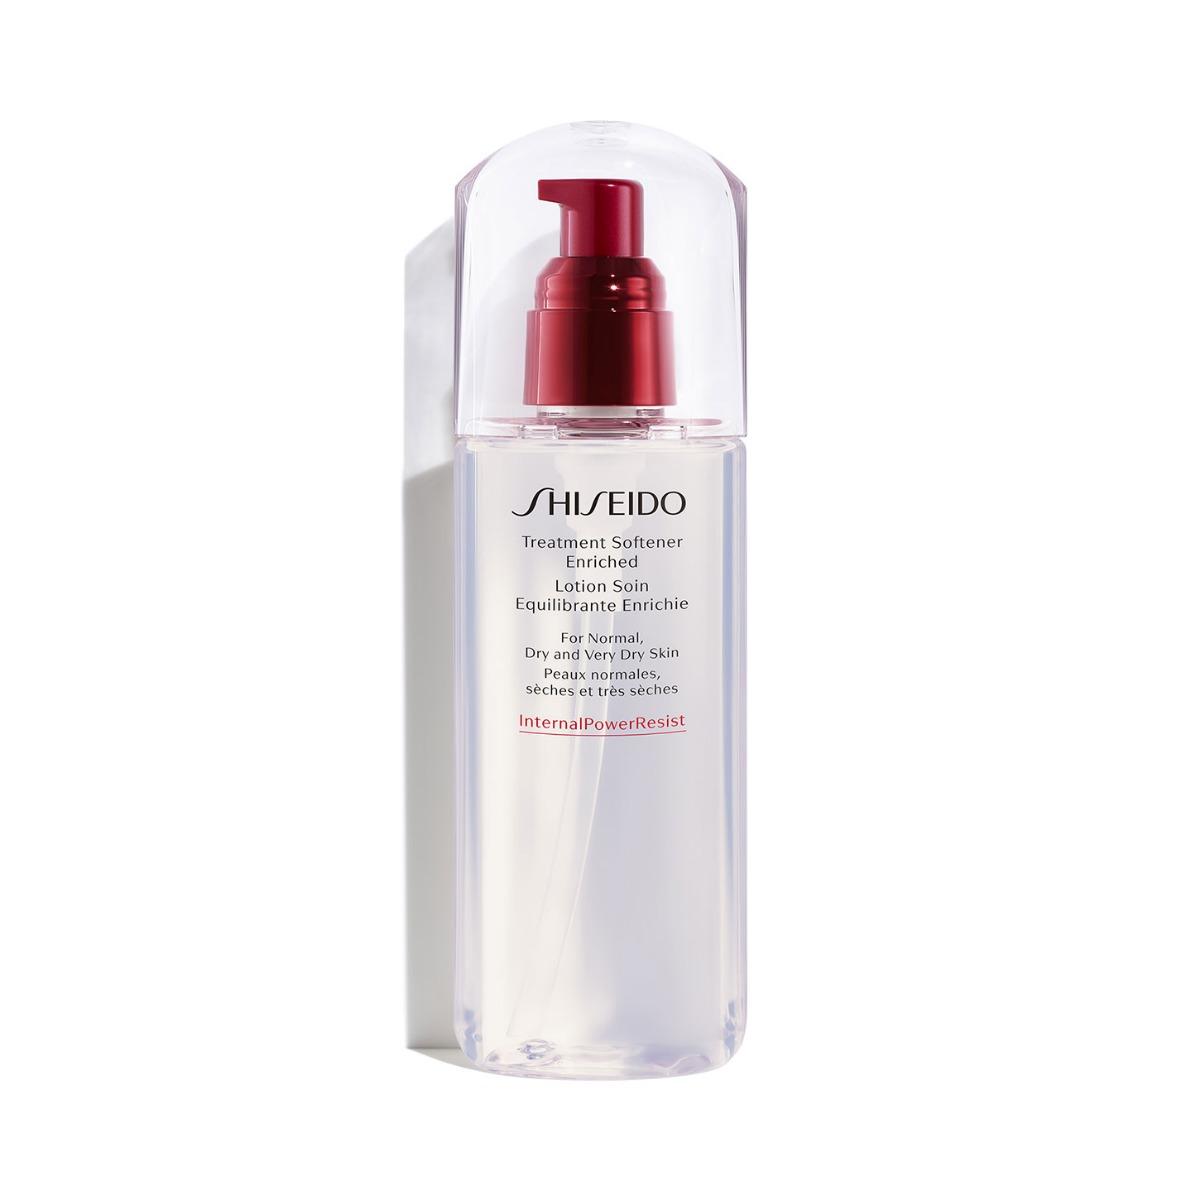 Shiseido - Lotion Soin Equilibrante Enrichie - 150 ml